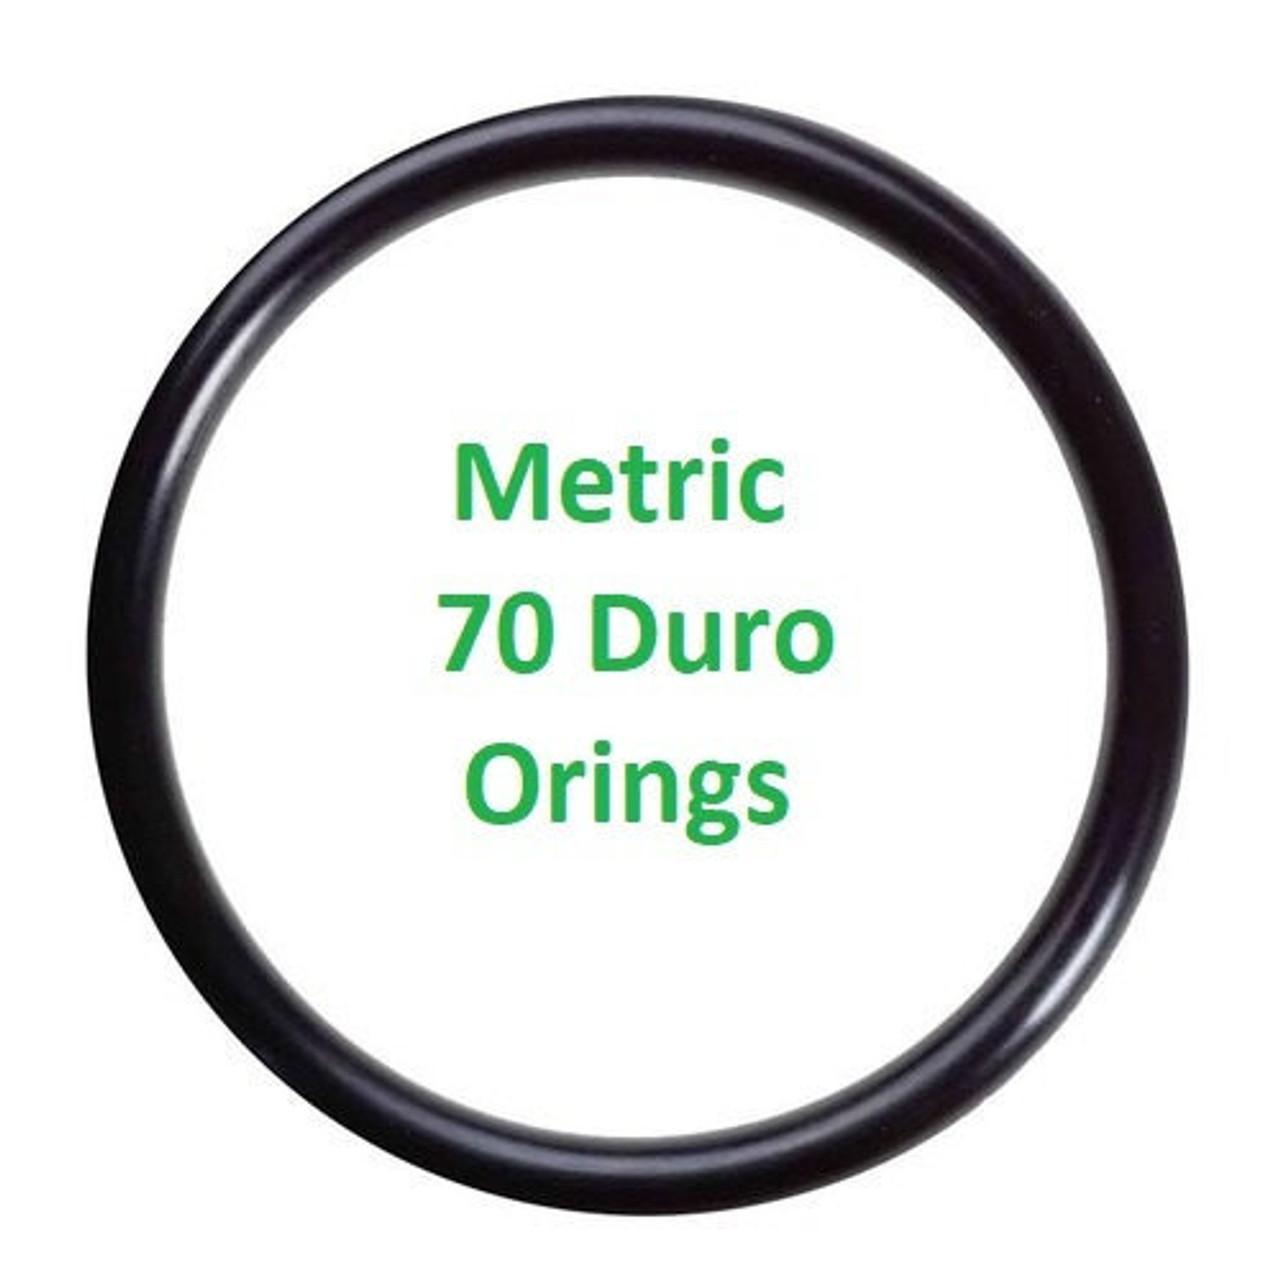 Metric Buna  O-rings 12 x 1.2mm Price for 25 pcs